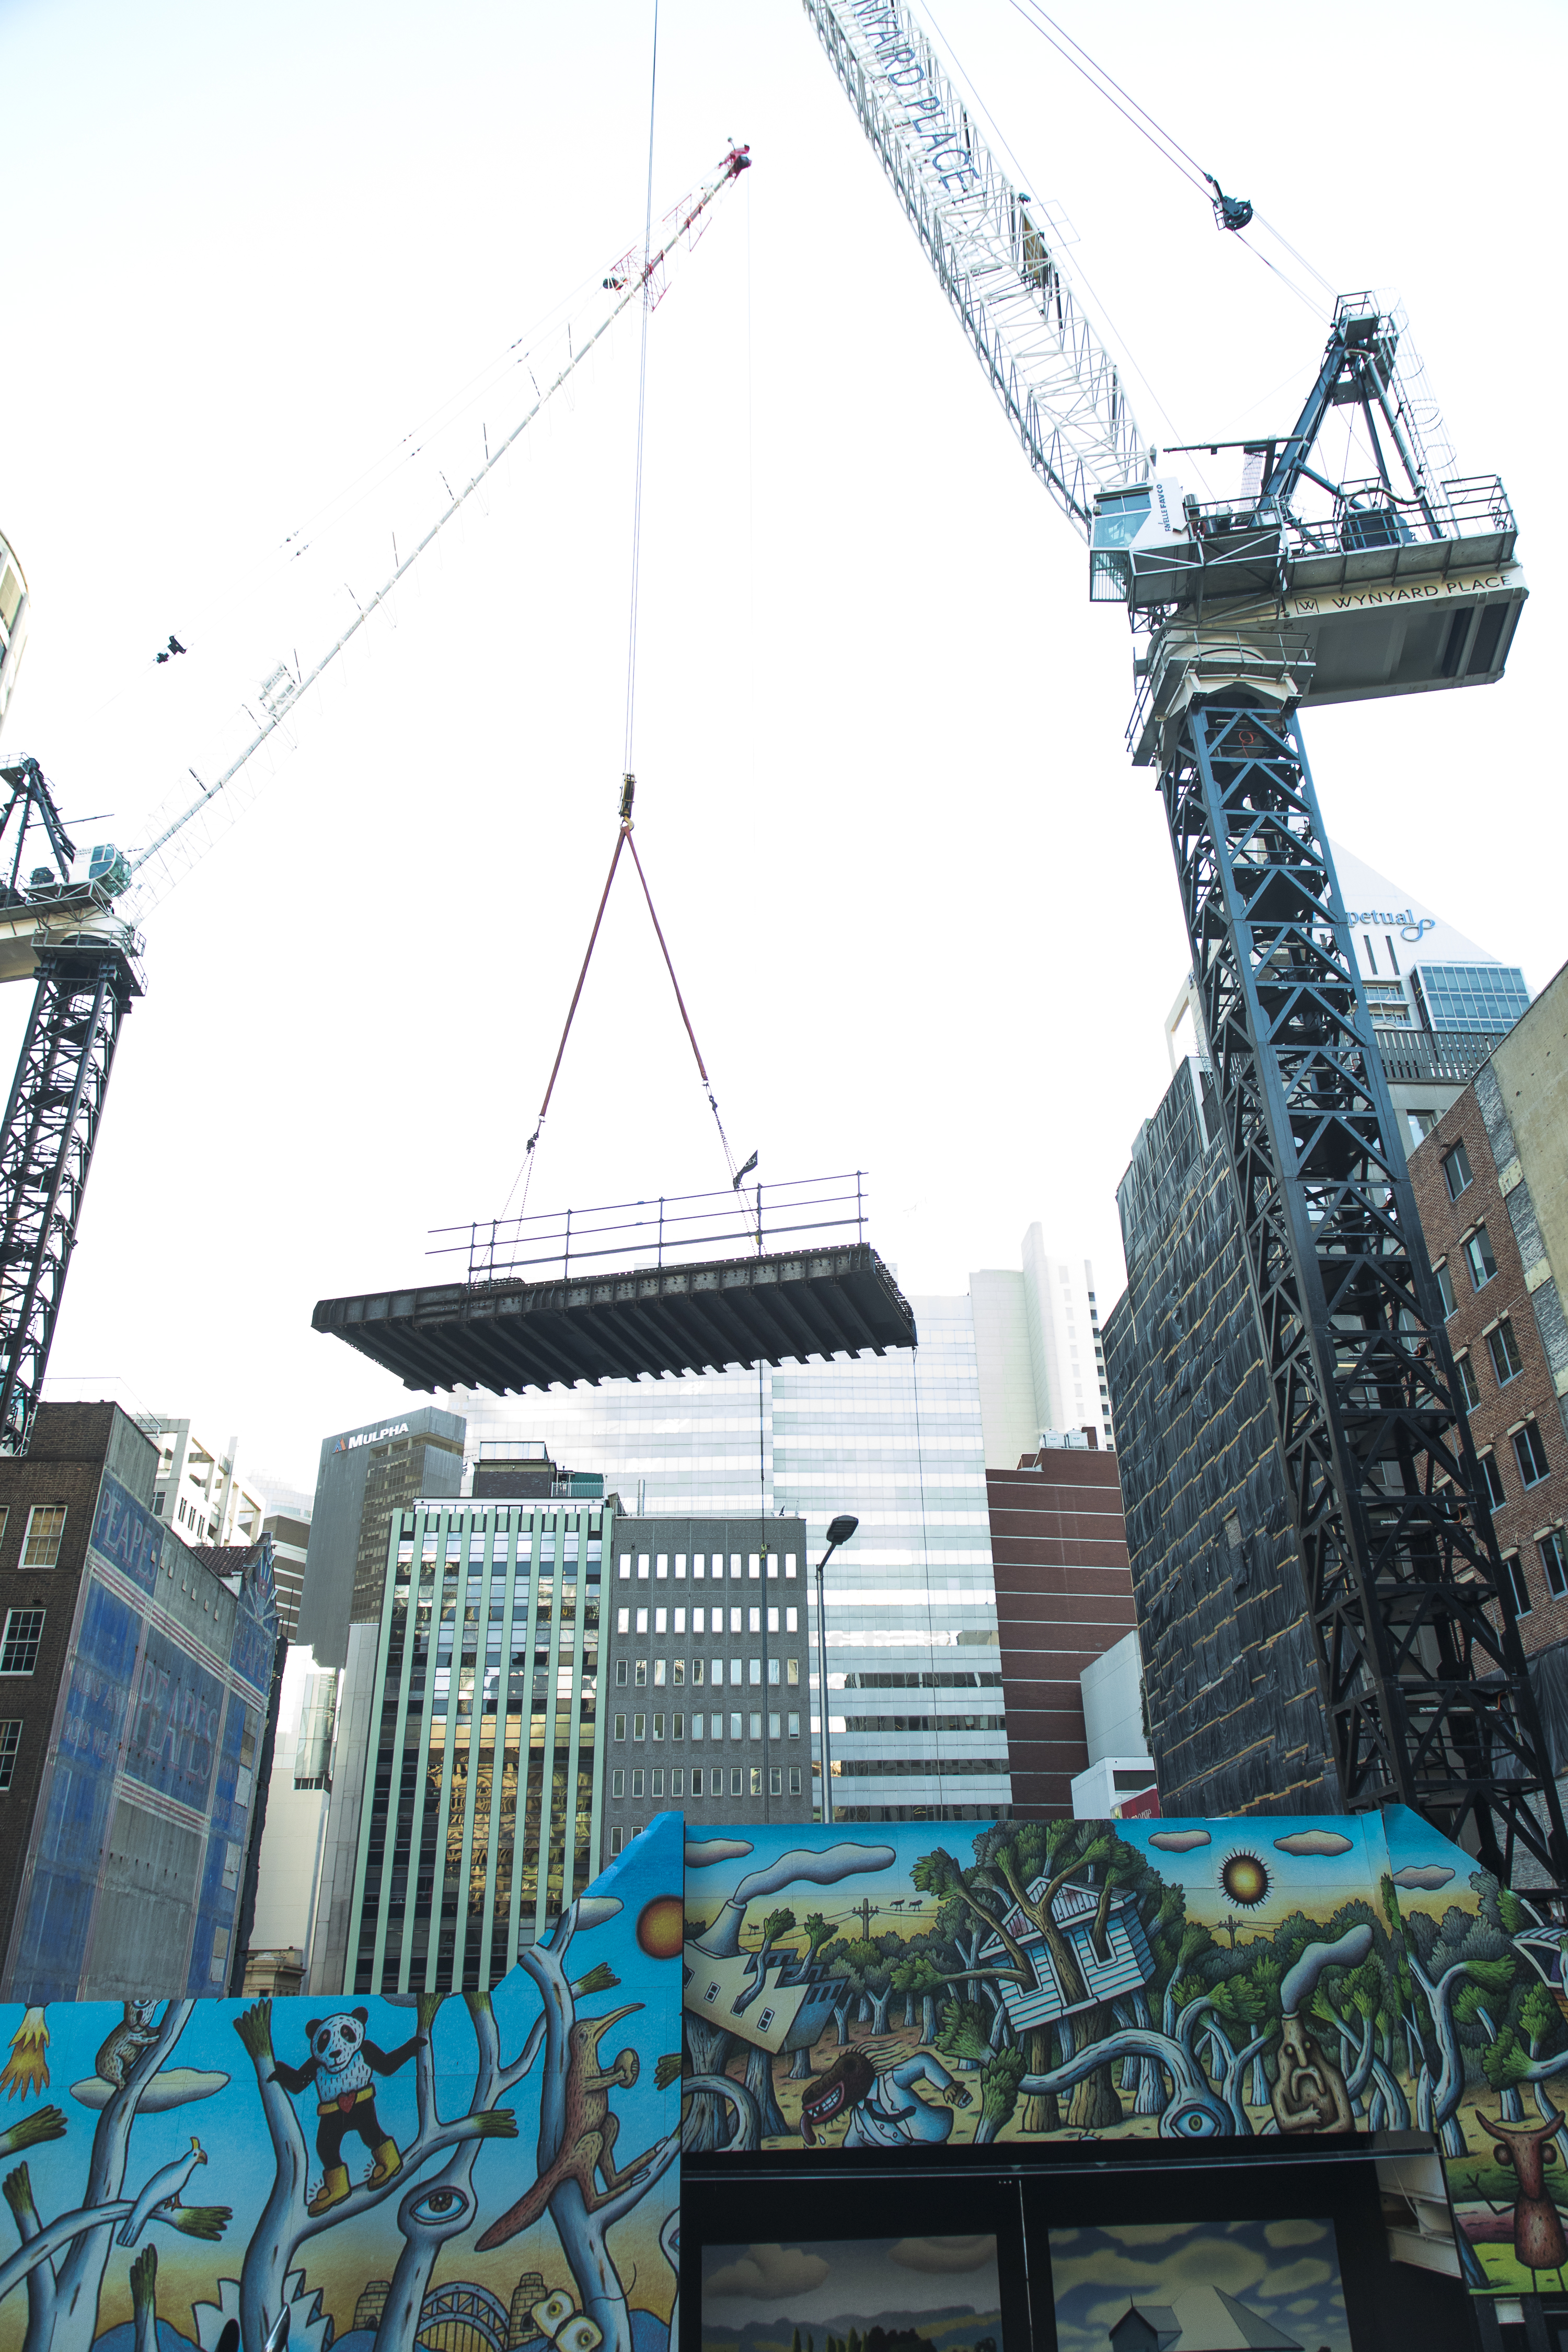 Tower Crane Operational